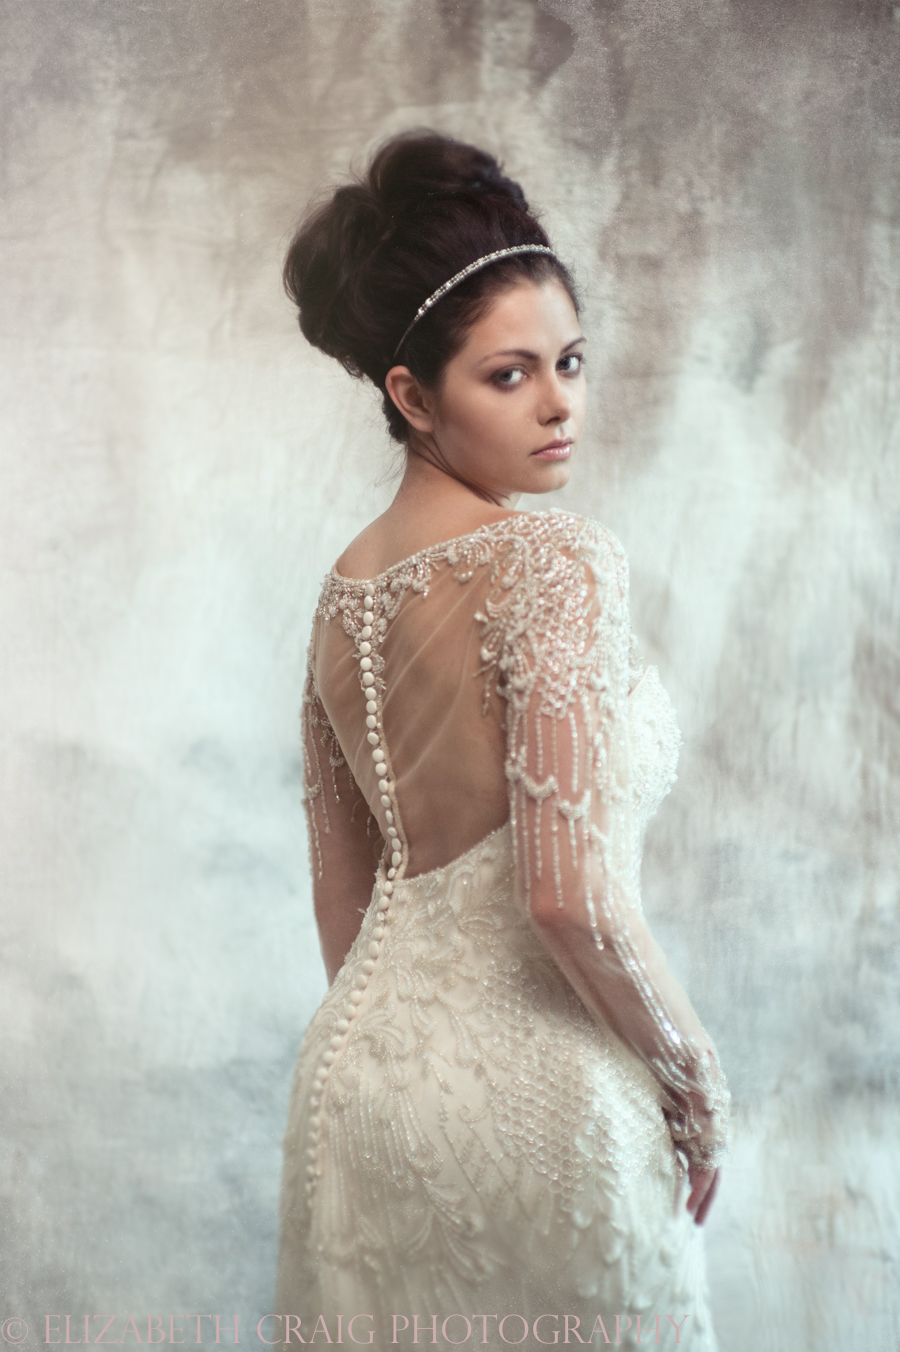 Pittsburgh Bridal Portraits | Elizabeth Craig Photography-005